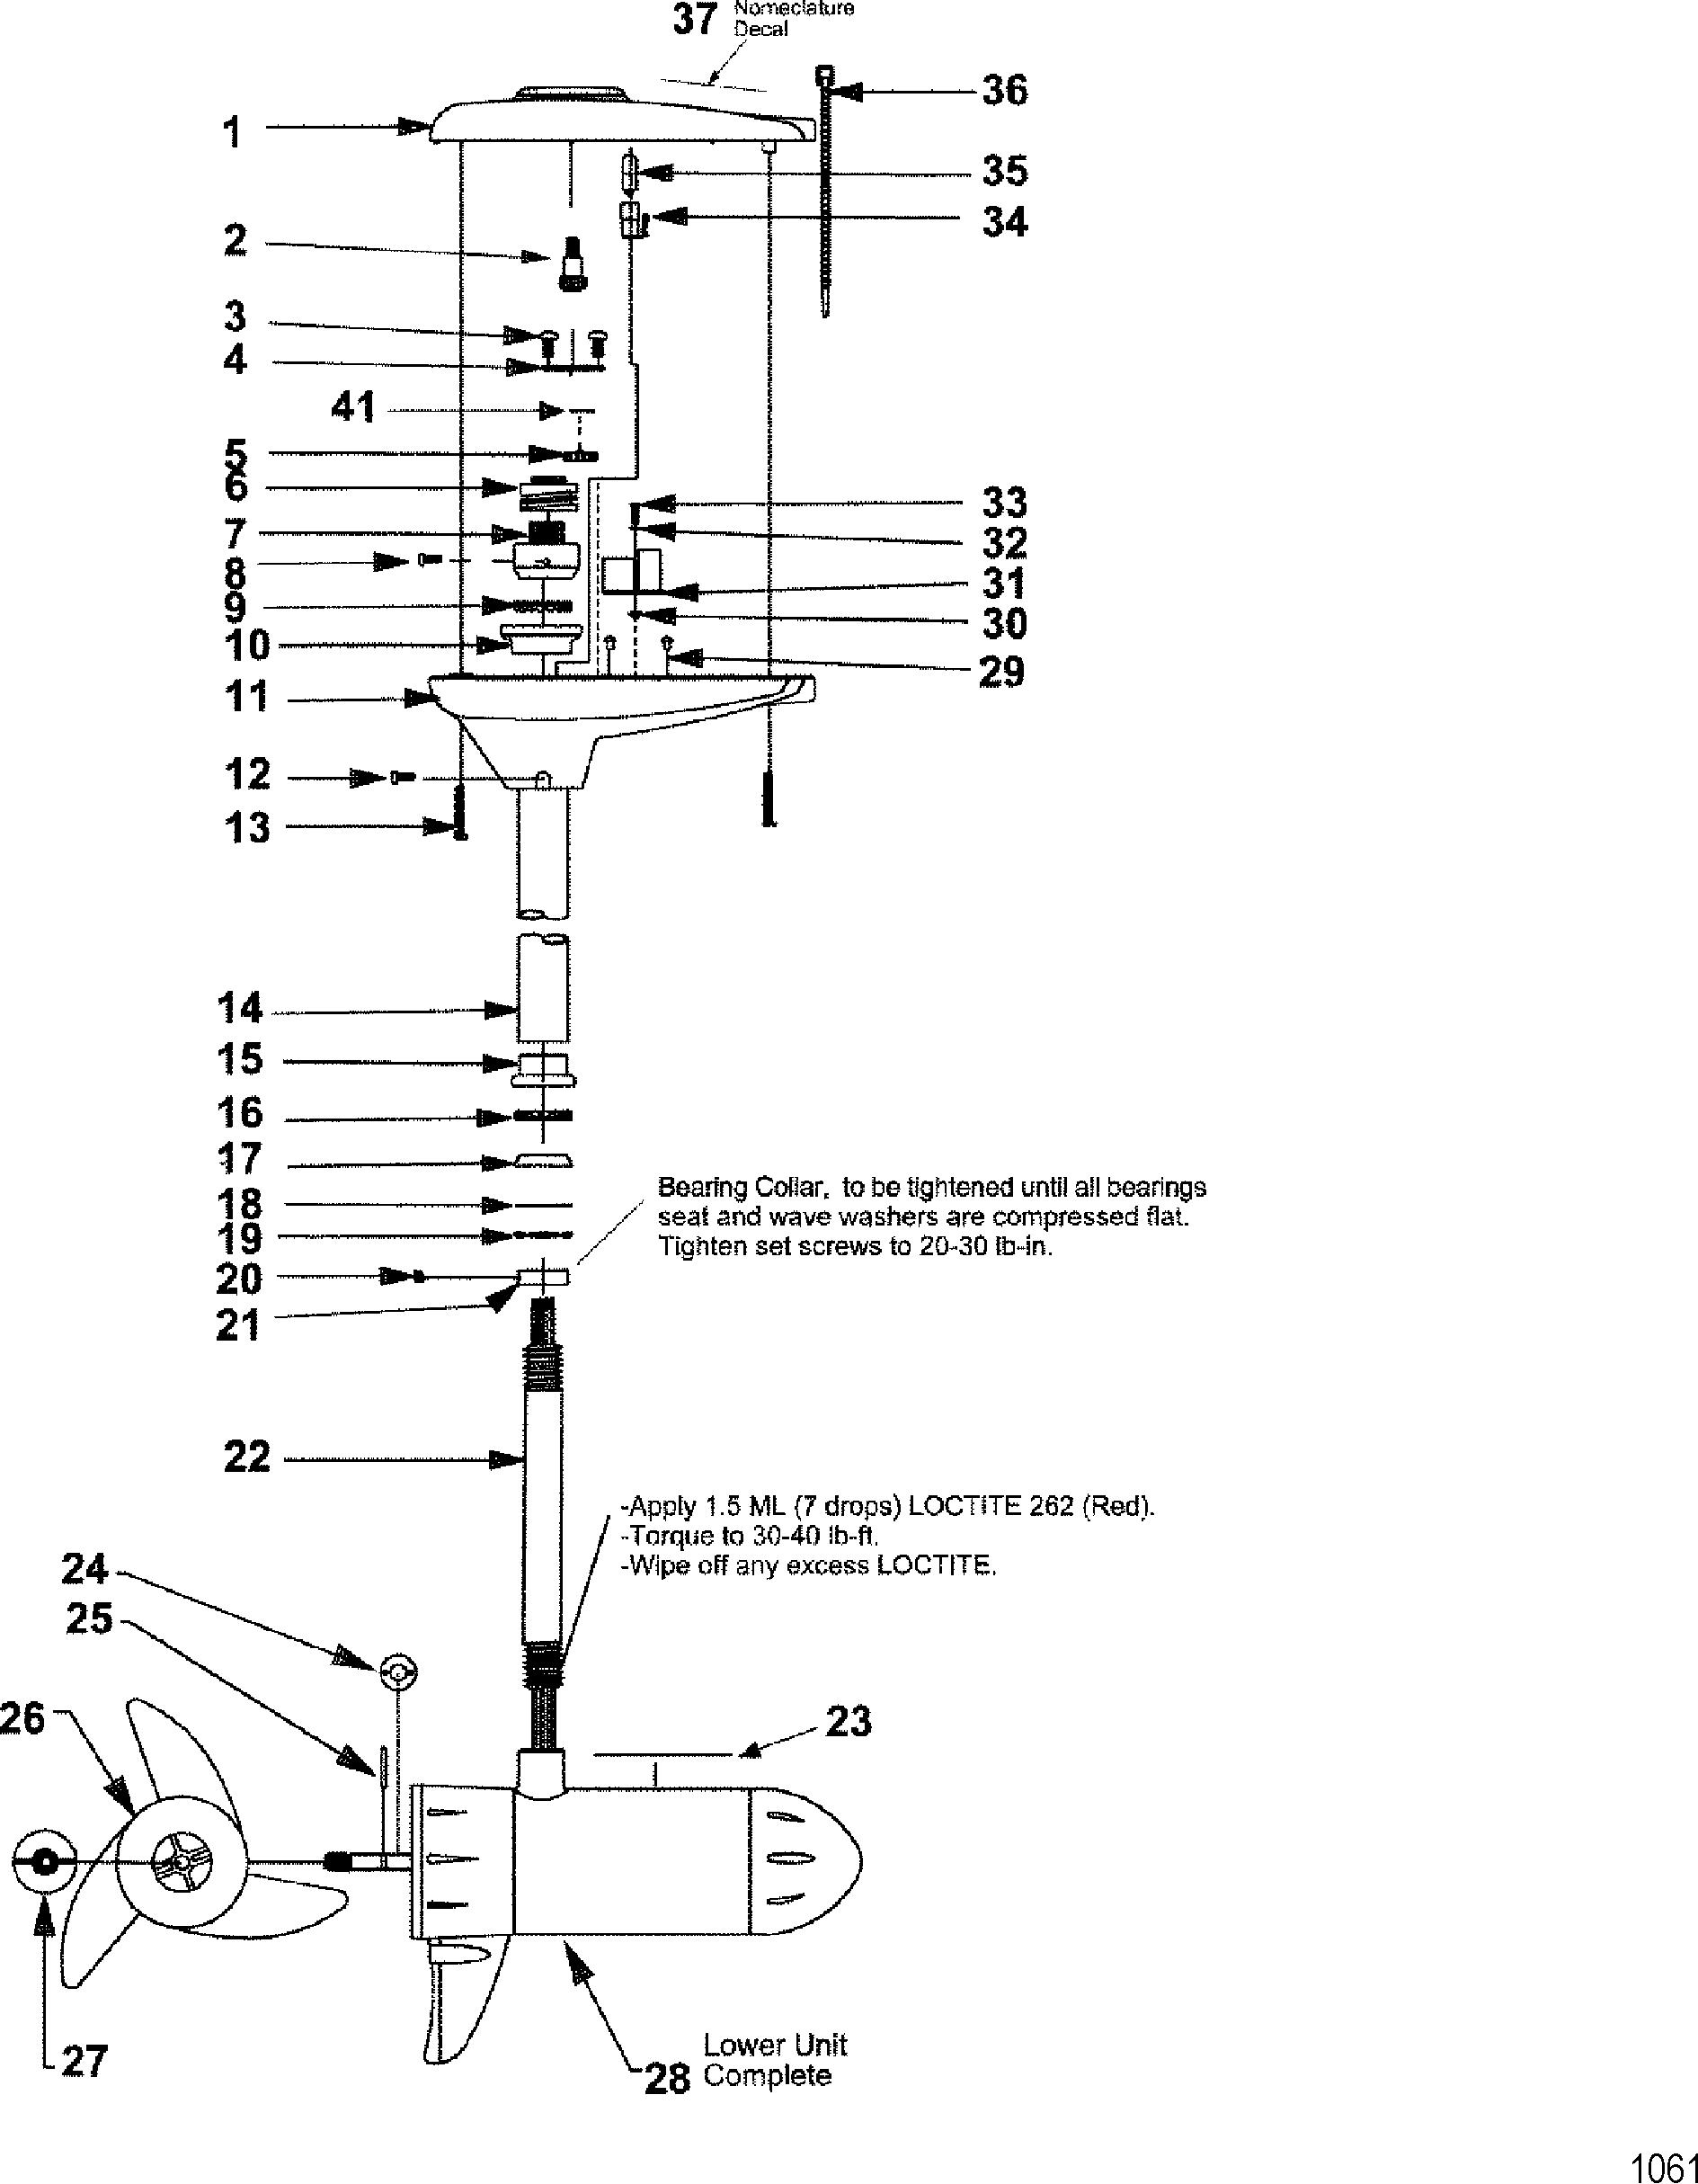 Motorguide 24 36 Volt Diagrams Wiring Diagram 4 Battery Complete Trolling Motor Model Te109vp For Rh Jamestowndistributors Com Thermostat